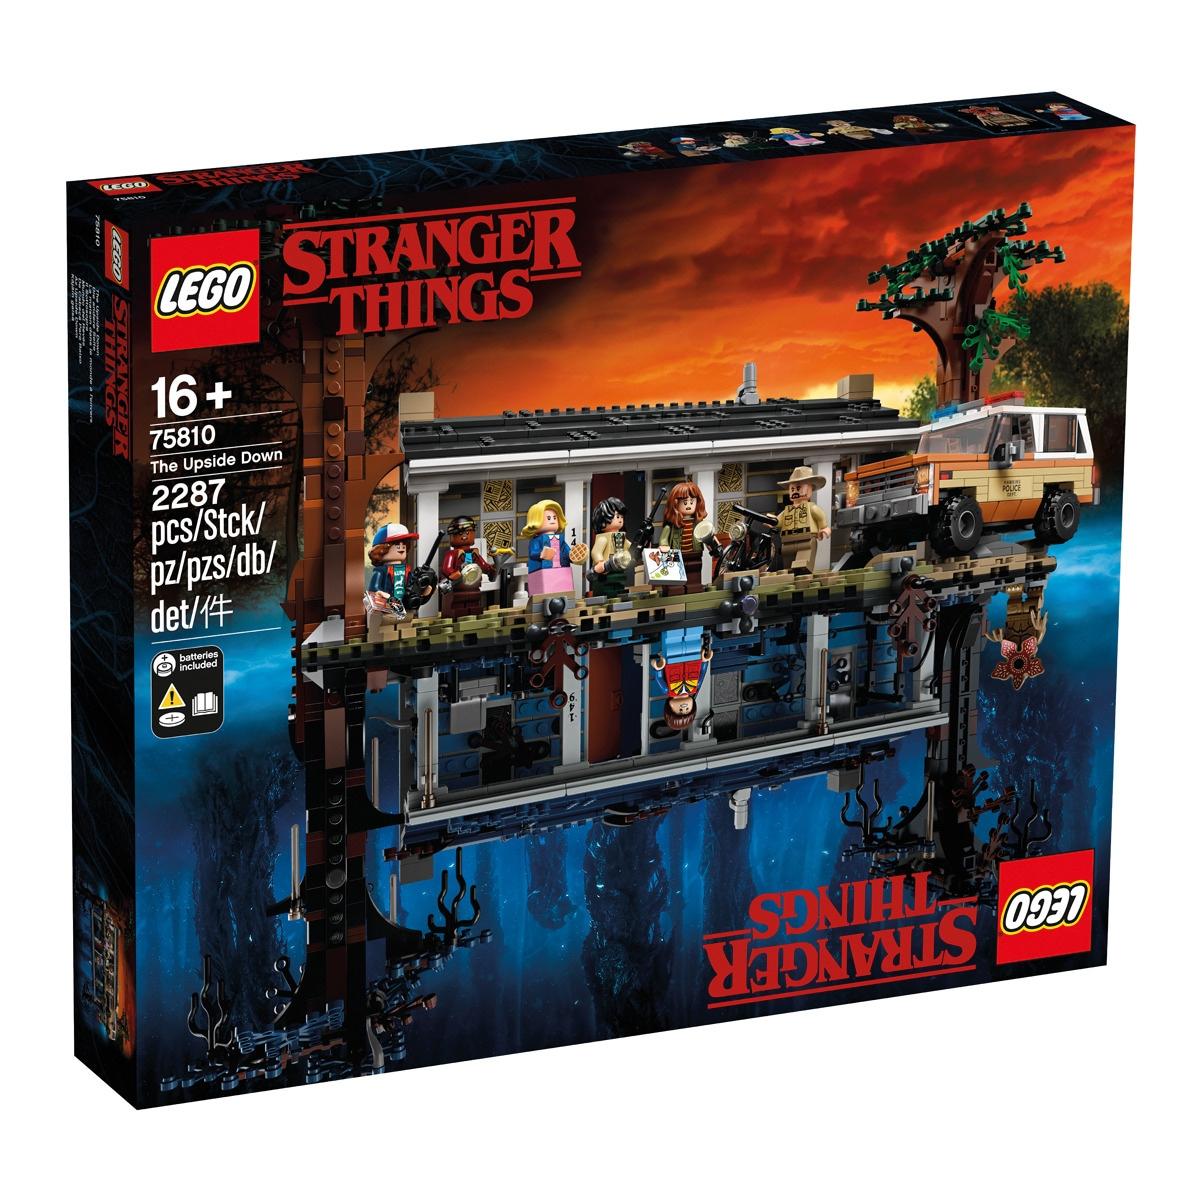 LEGO - Mundo del Revés Lego Stranger Things